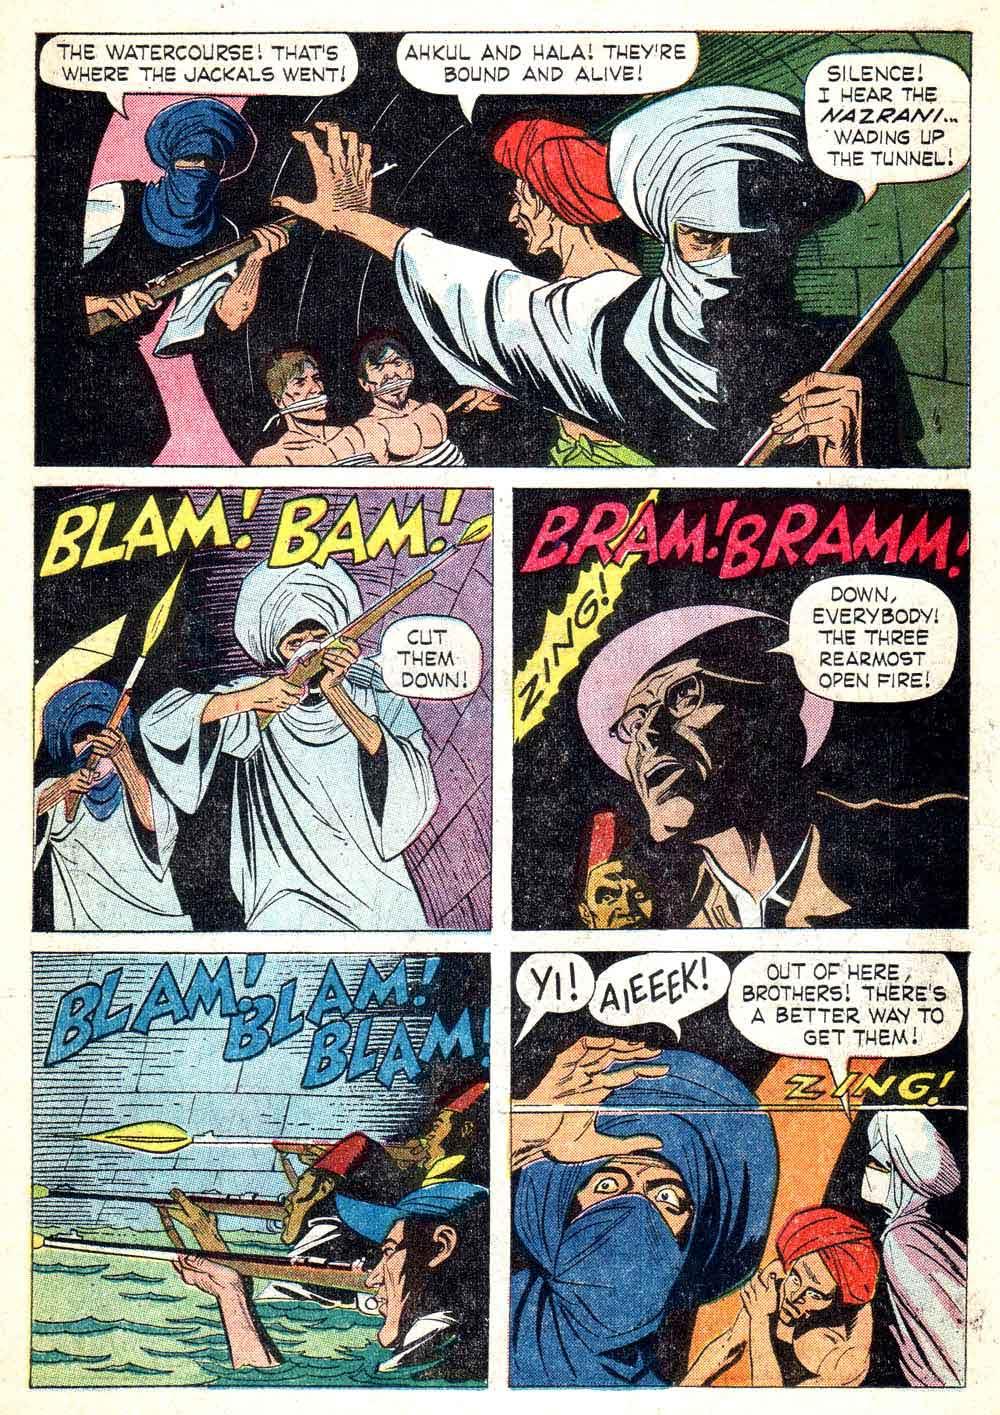 Korak Son of Tarzan v1 #9 gold key silver age 1960s comic book page art by Russ Manning